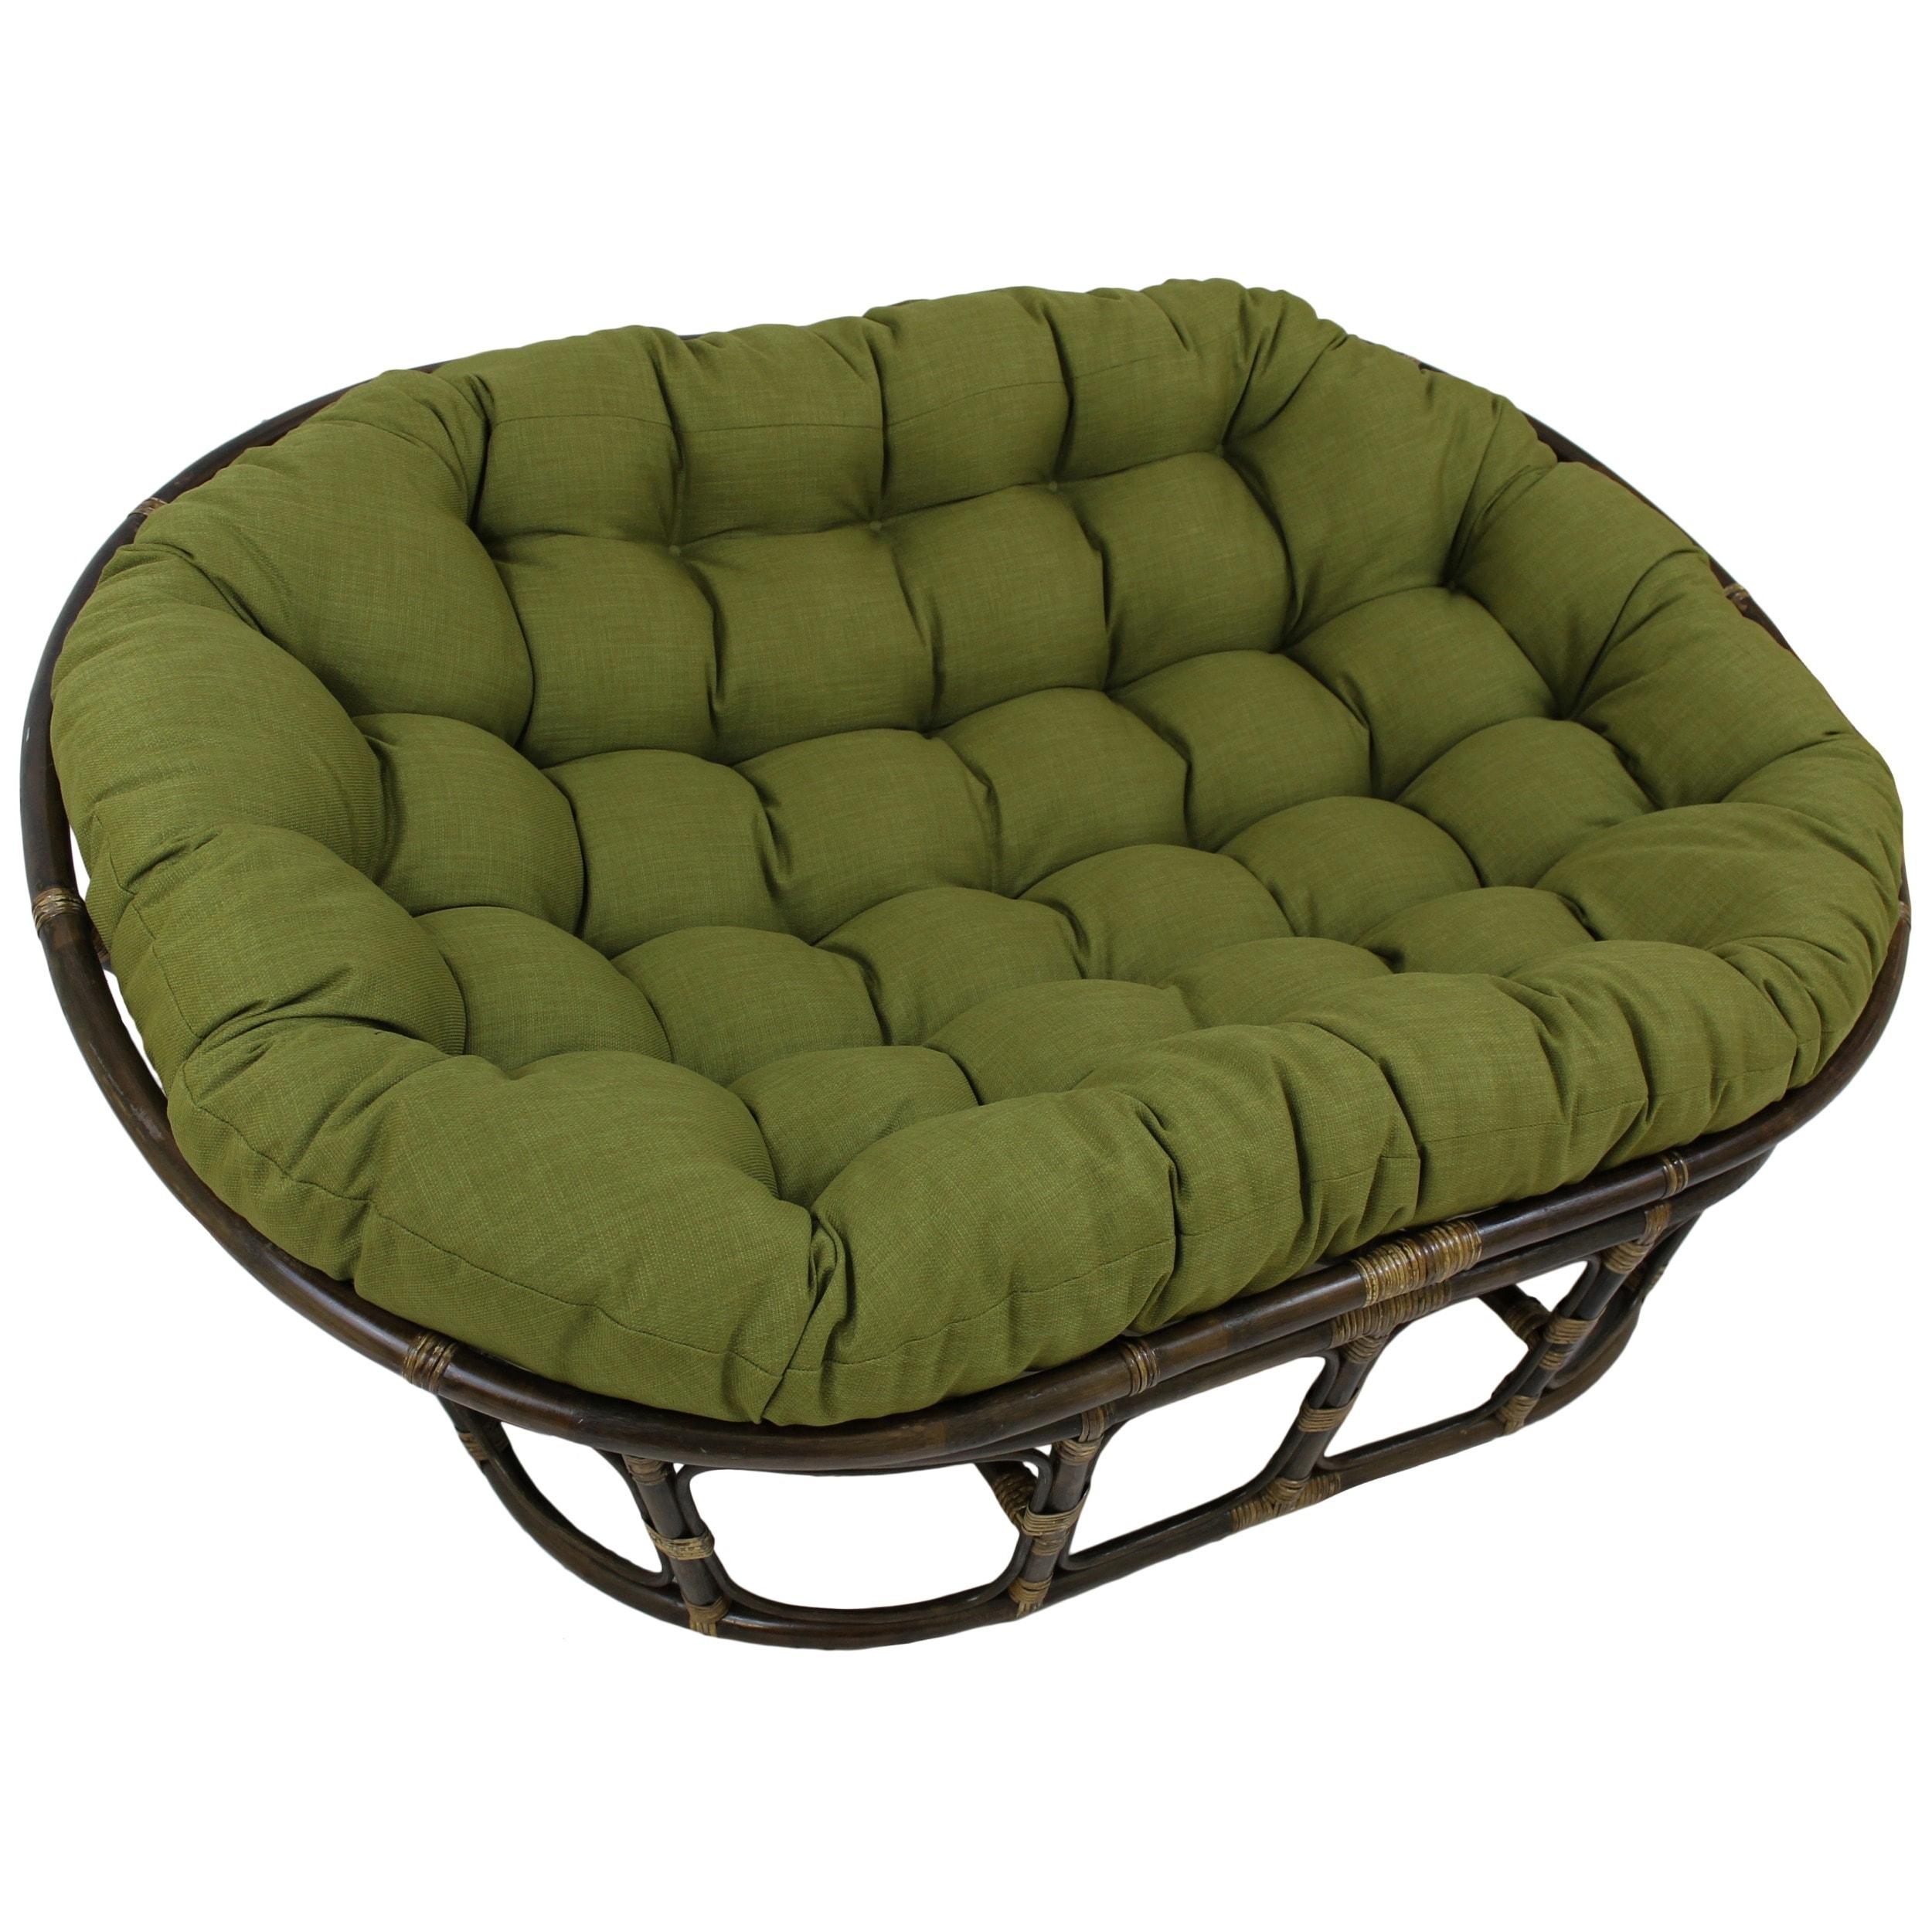 blazing needles indoor outdoor double papasan cushion 48 x 65 ebay. Black Bedroom Furniture Sets. Home Design Ideas